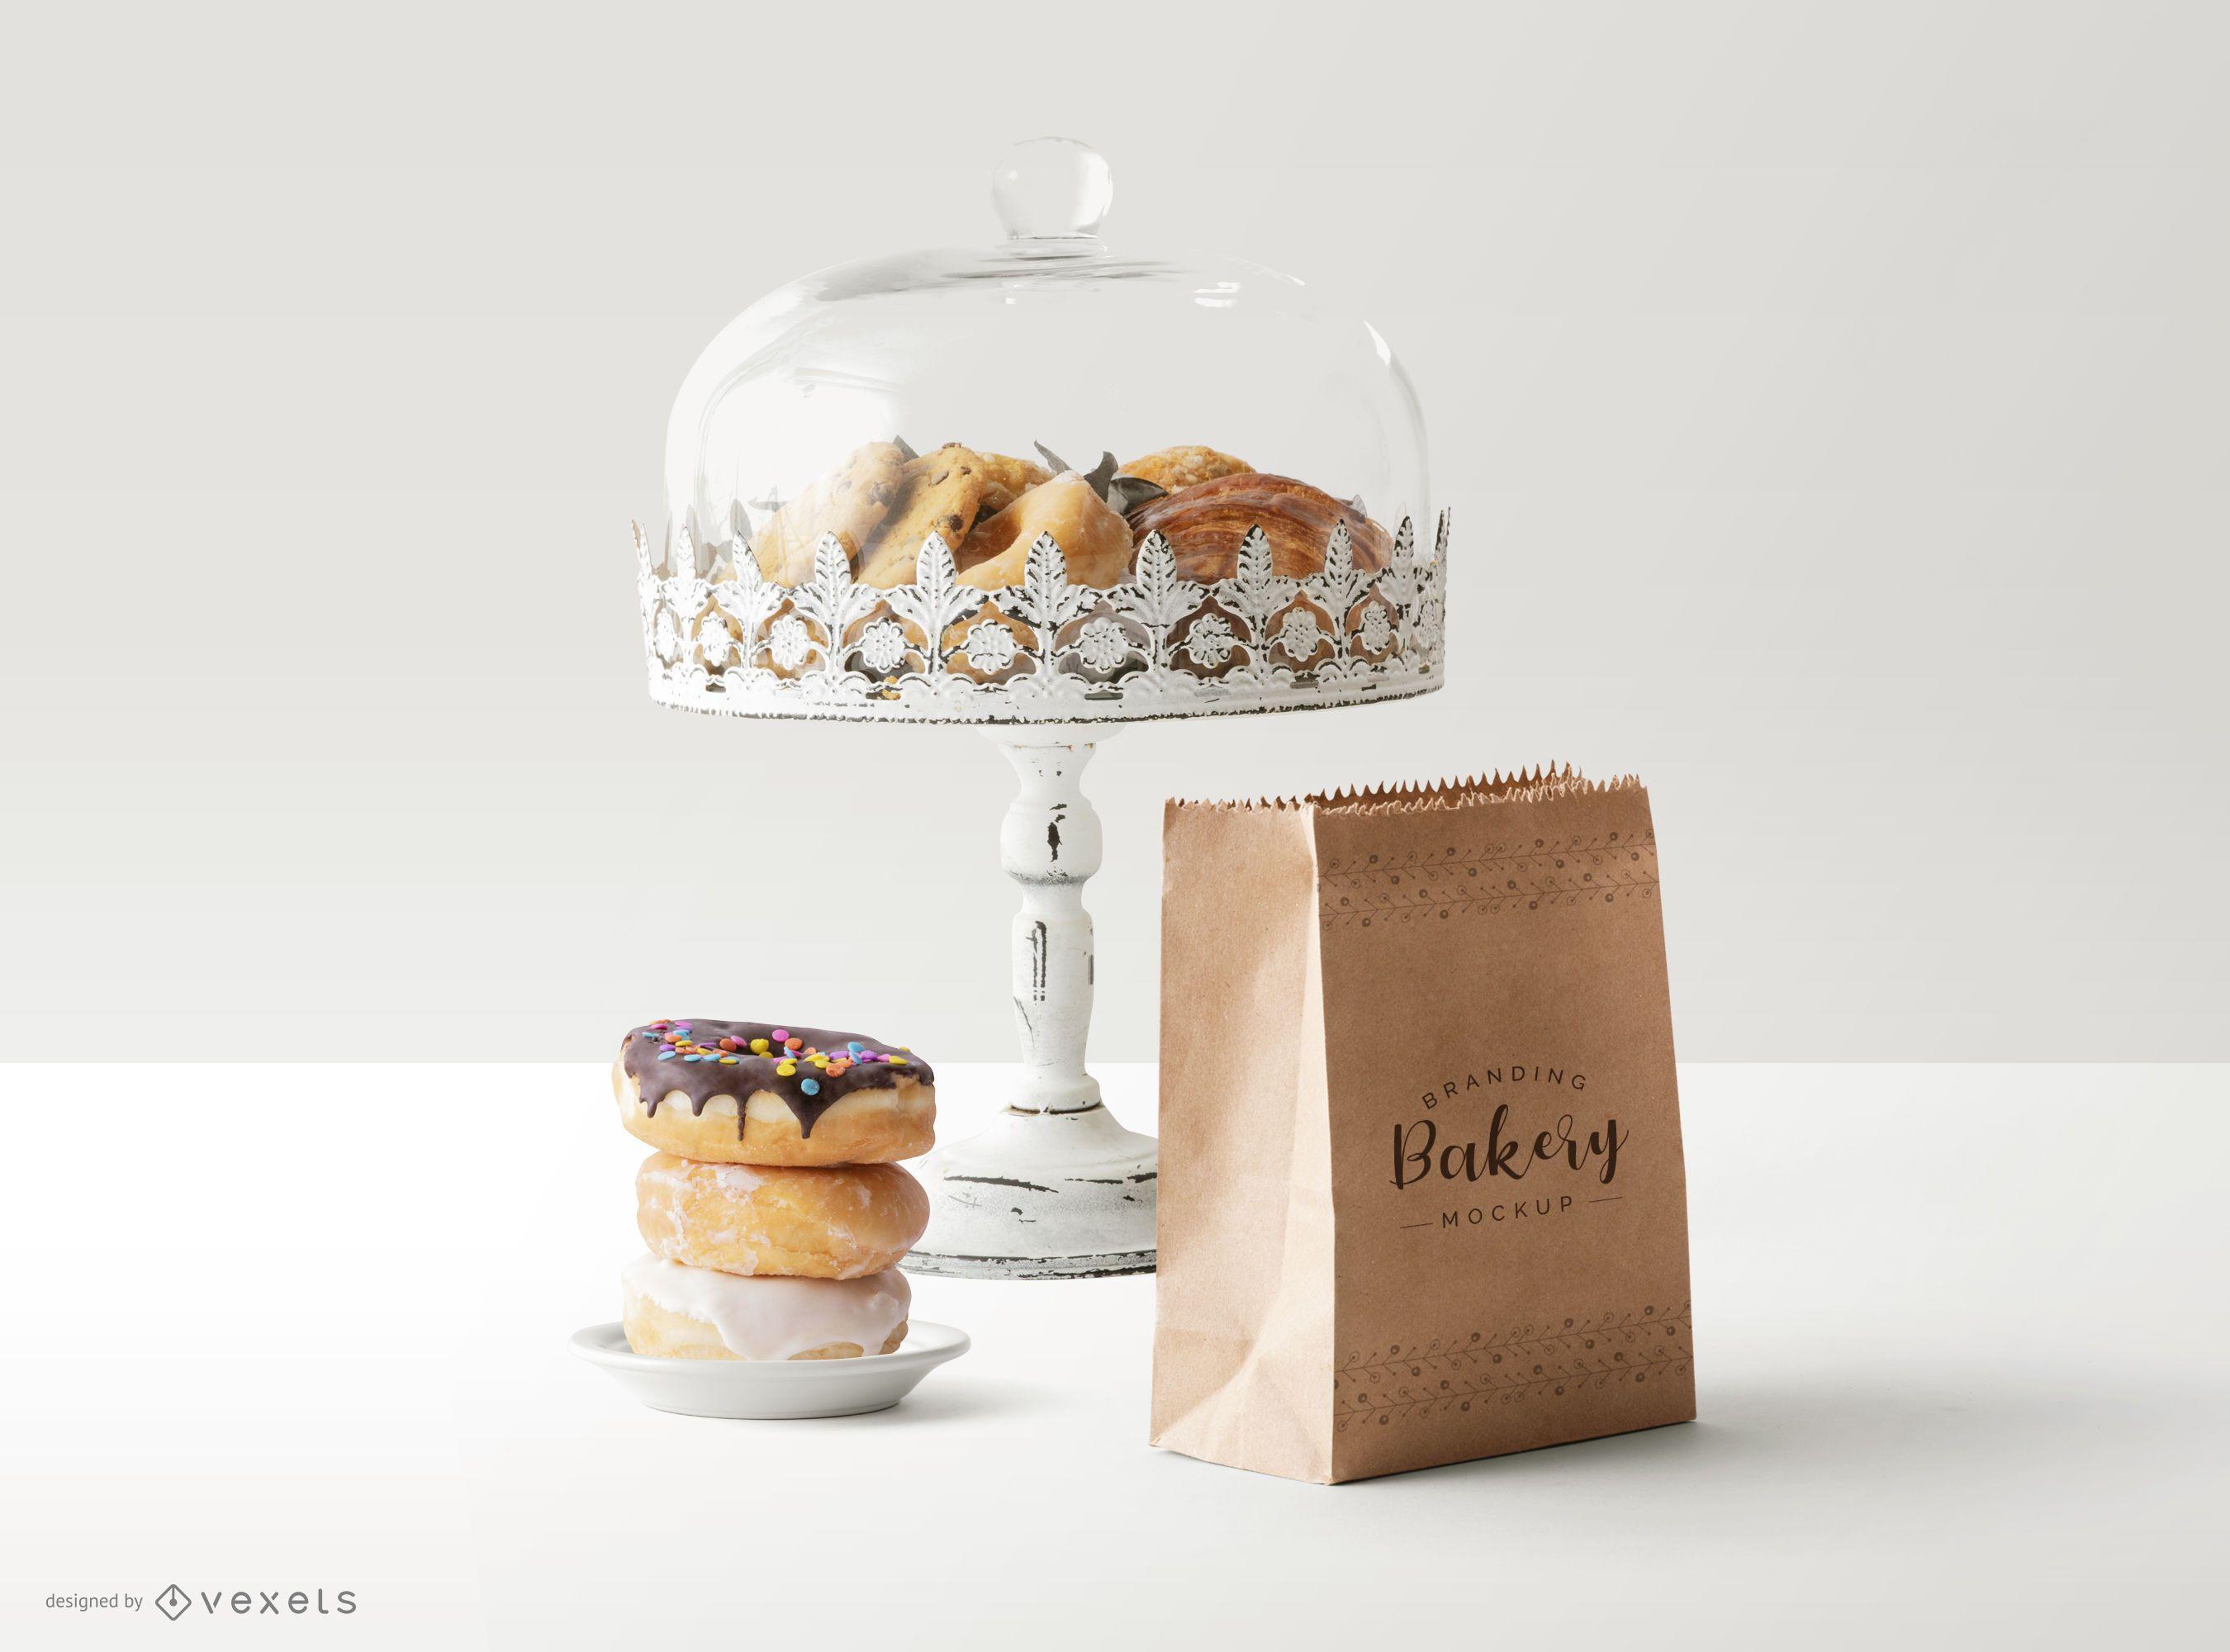 Bakery Object Composition Mockup